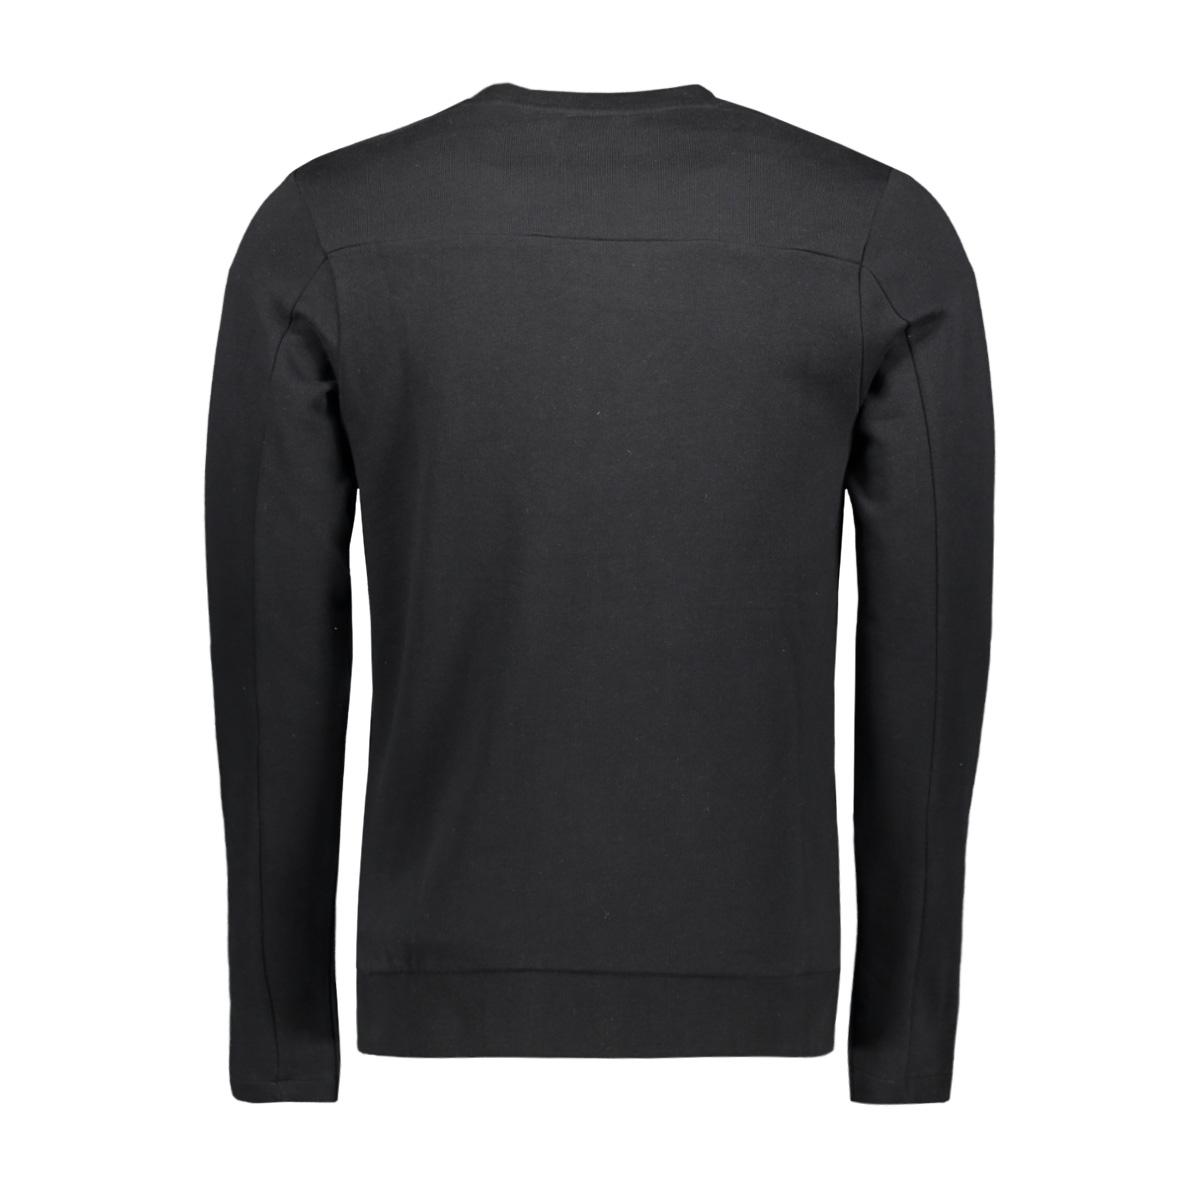 jprcato bla. sweat crew neck 12159824 jack & jones sweater black/slim fit